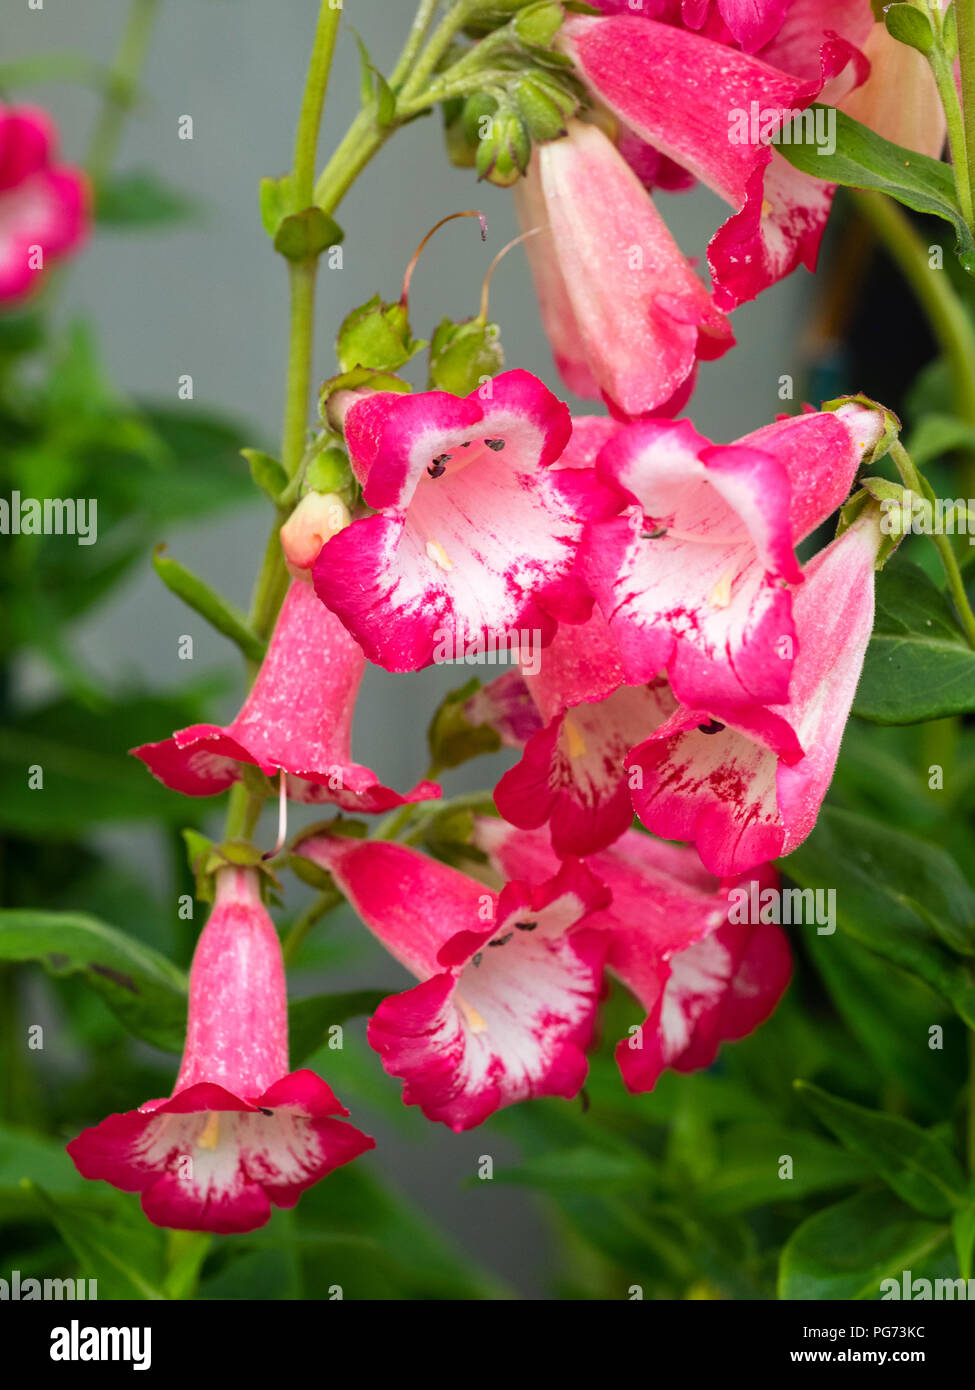 Tubular White Flowers Stock Photos Tubular White Flowers Stock